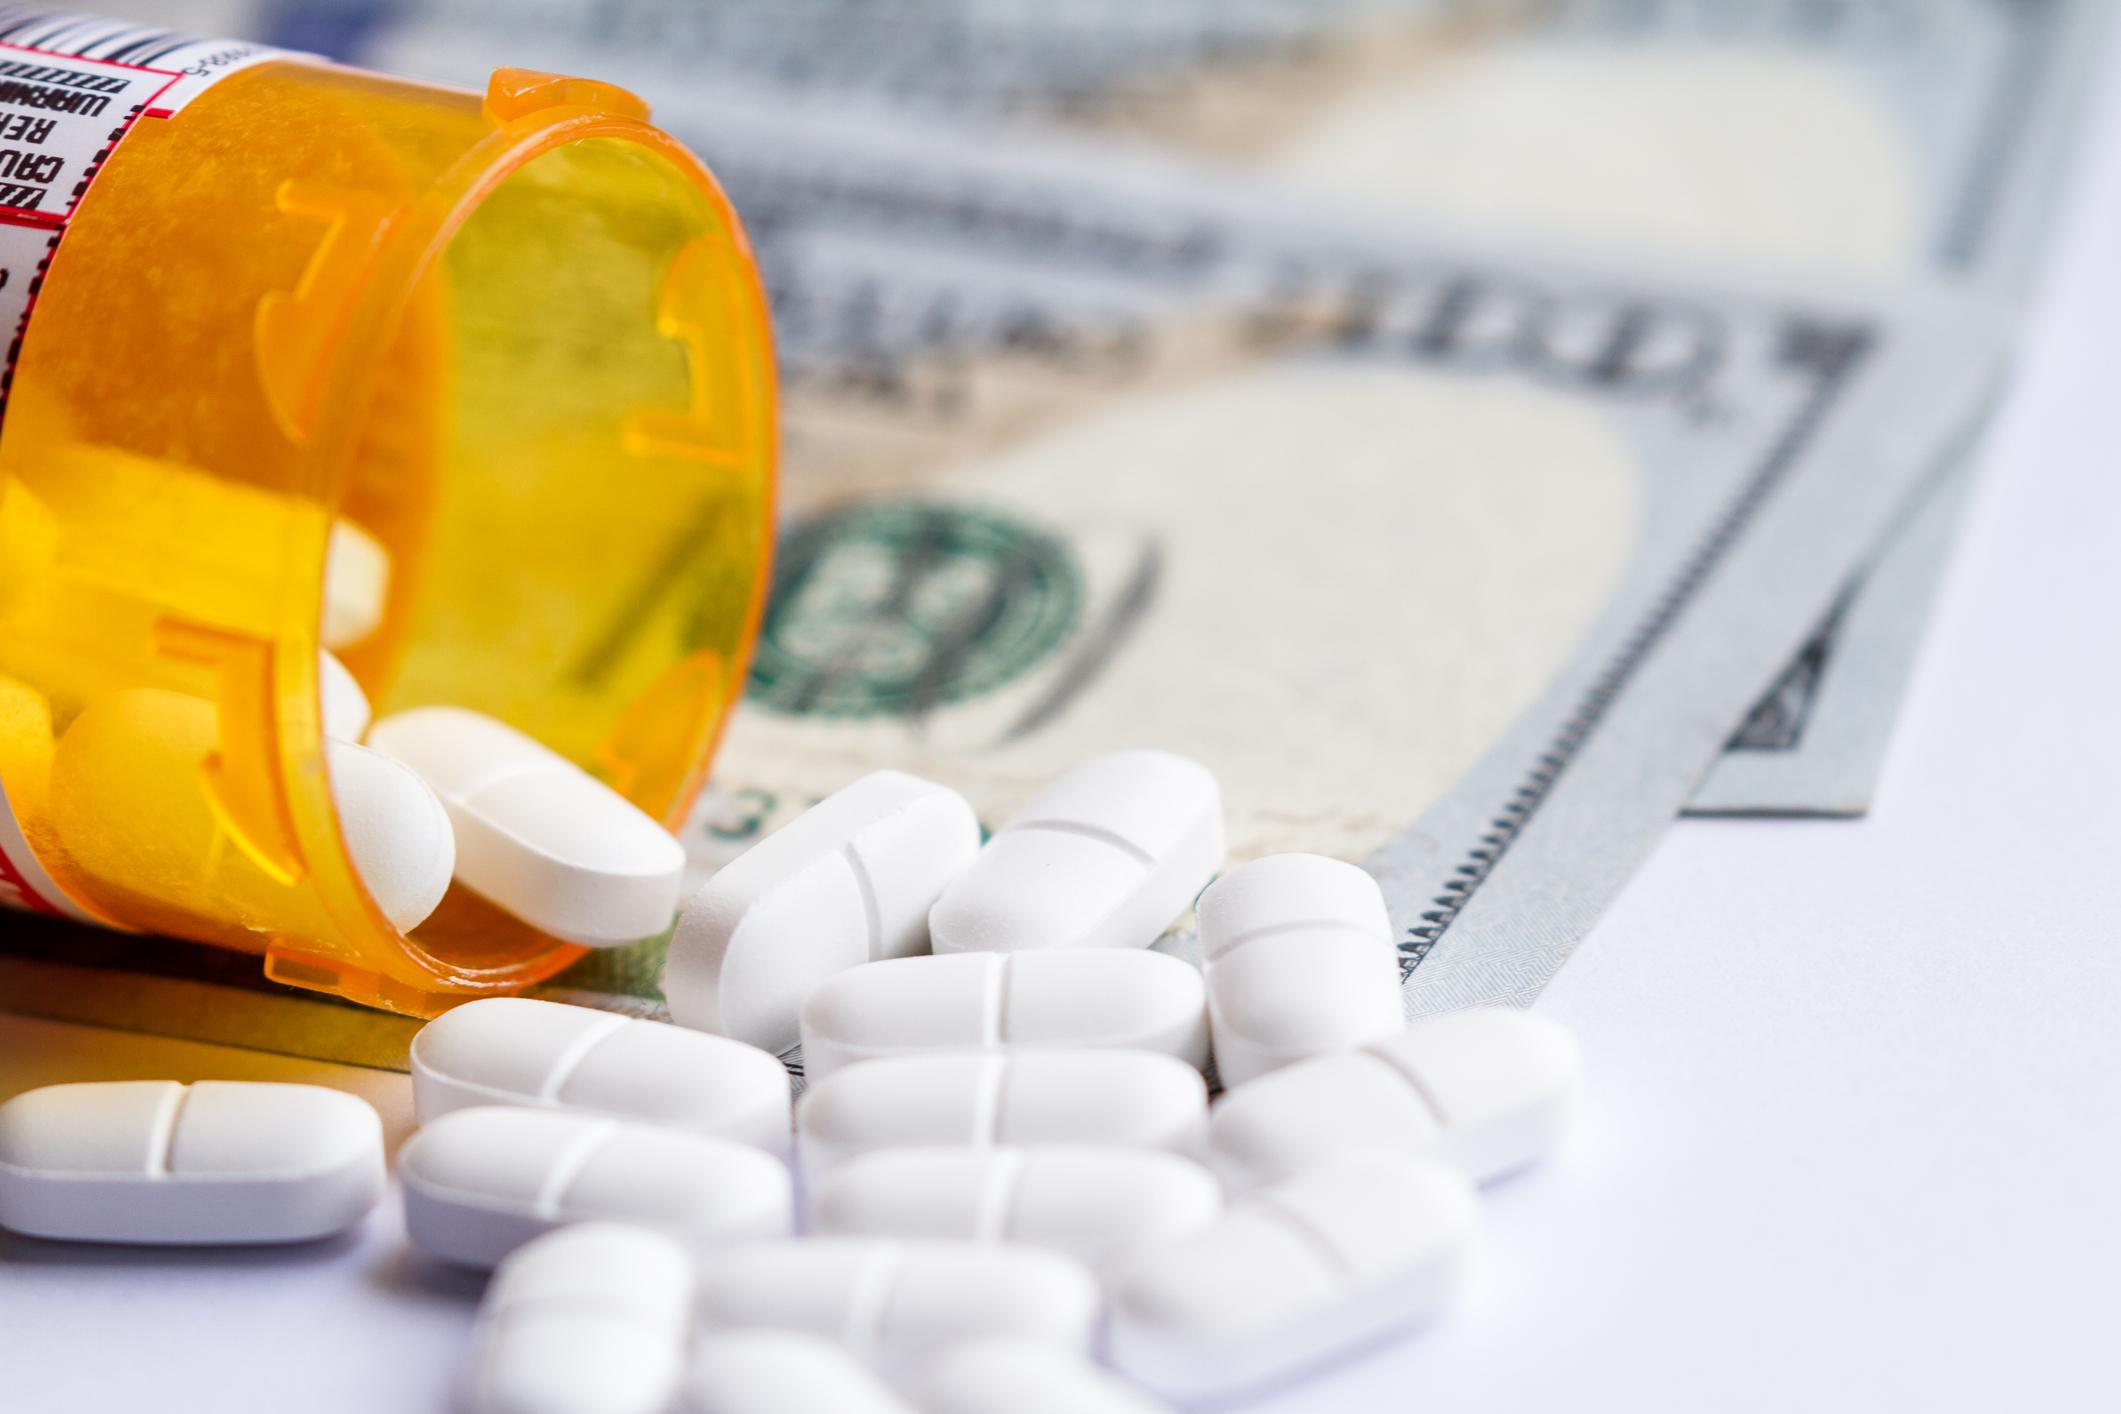 Prescription pills and money.